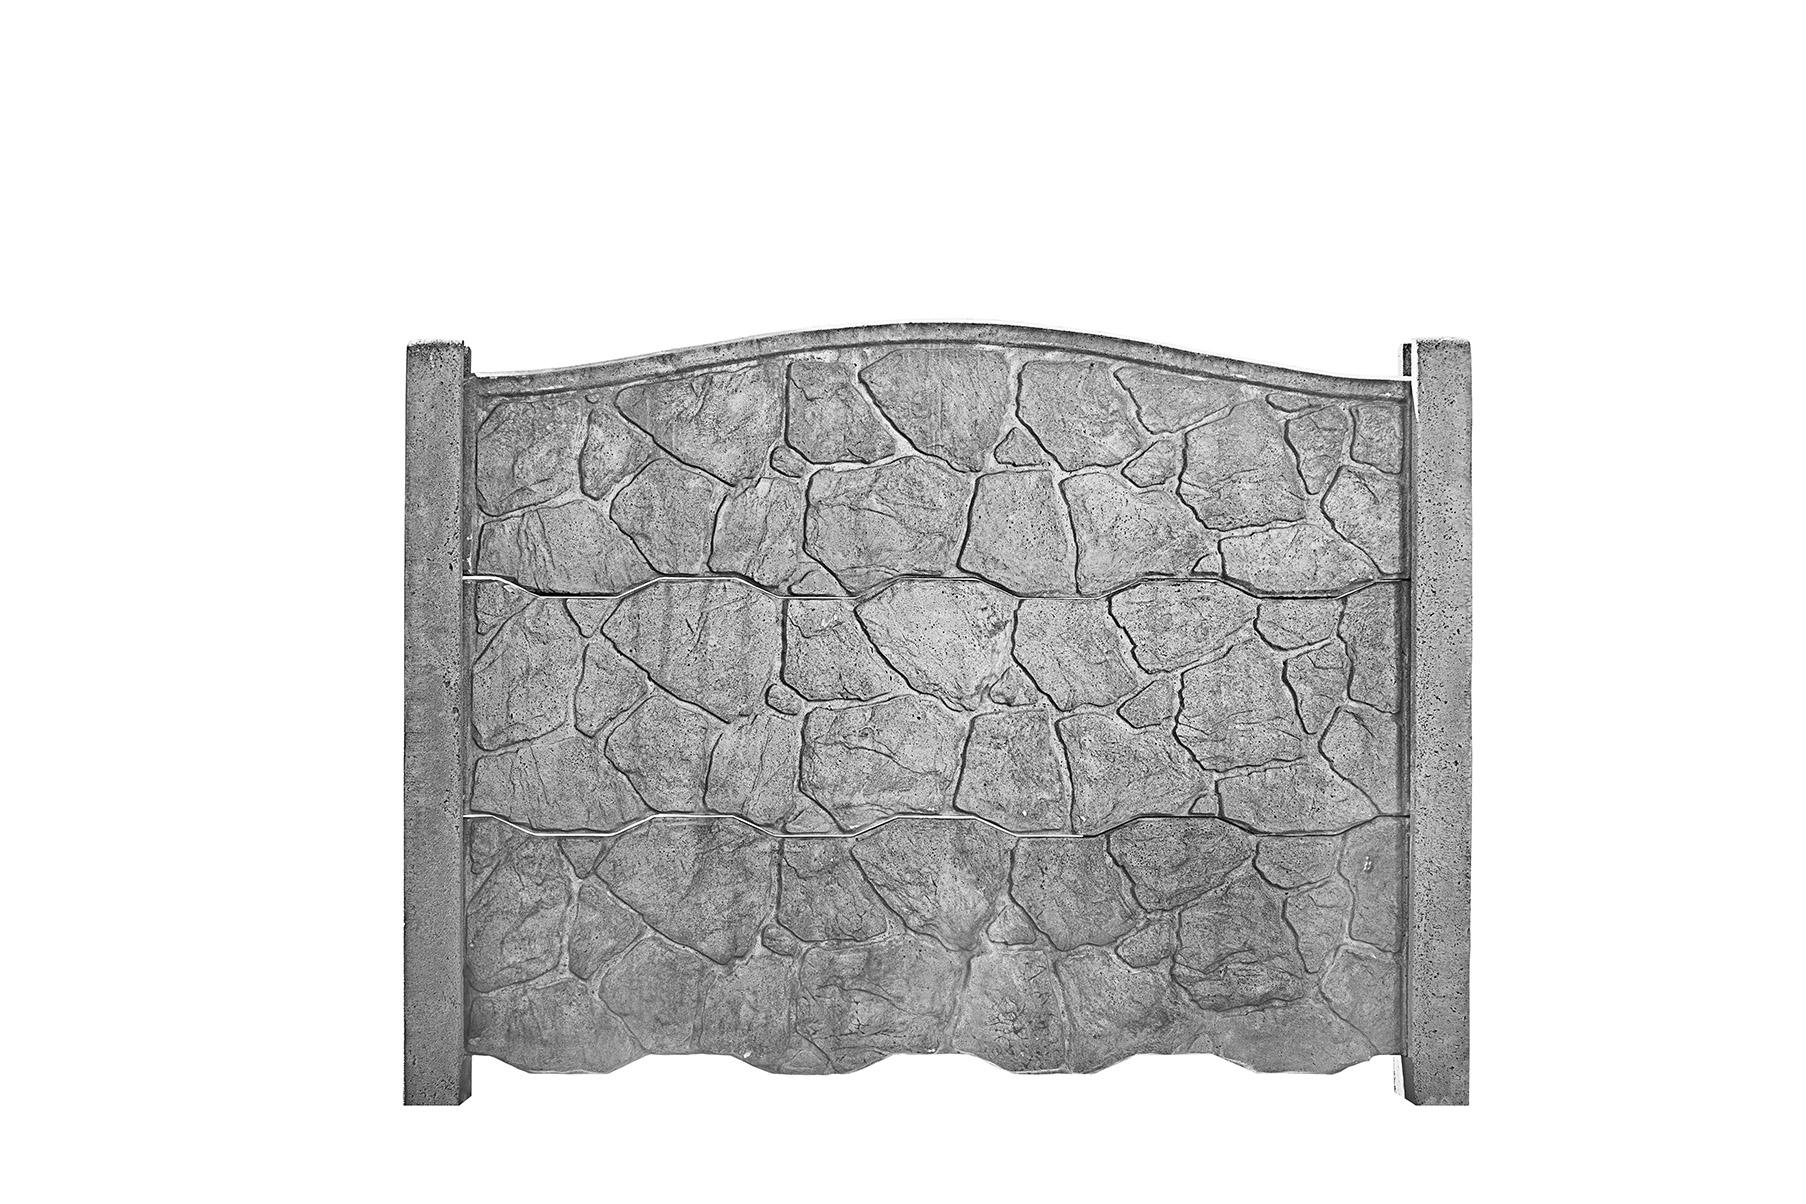 betónové ploty číslo modelu 24